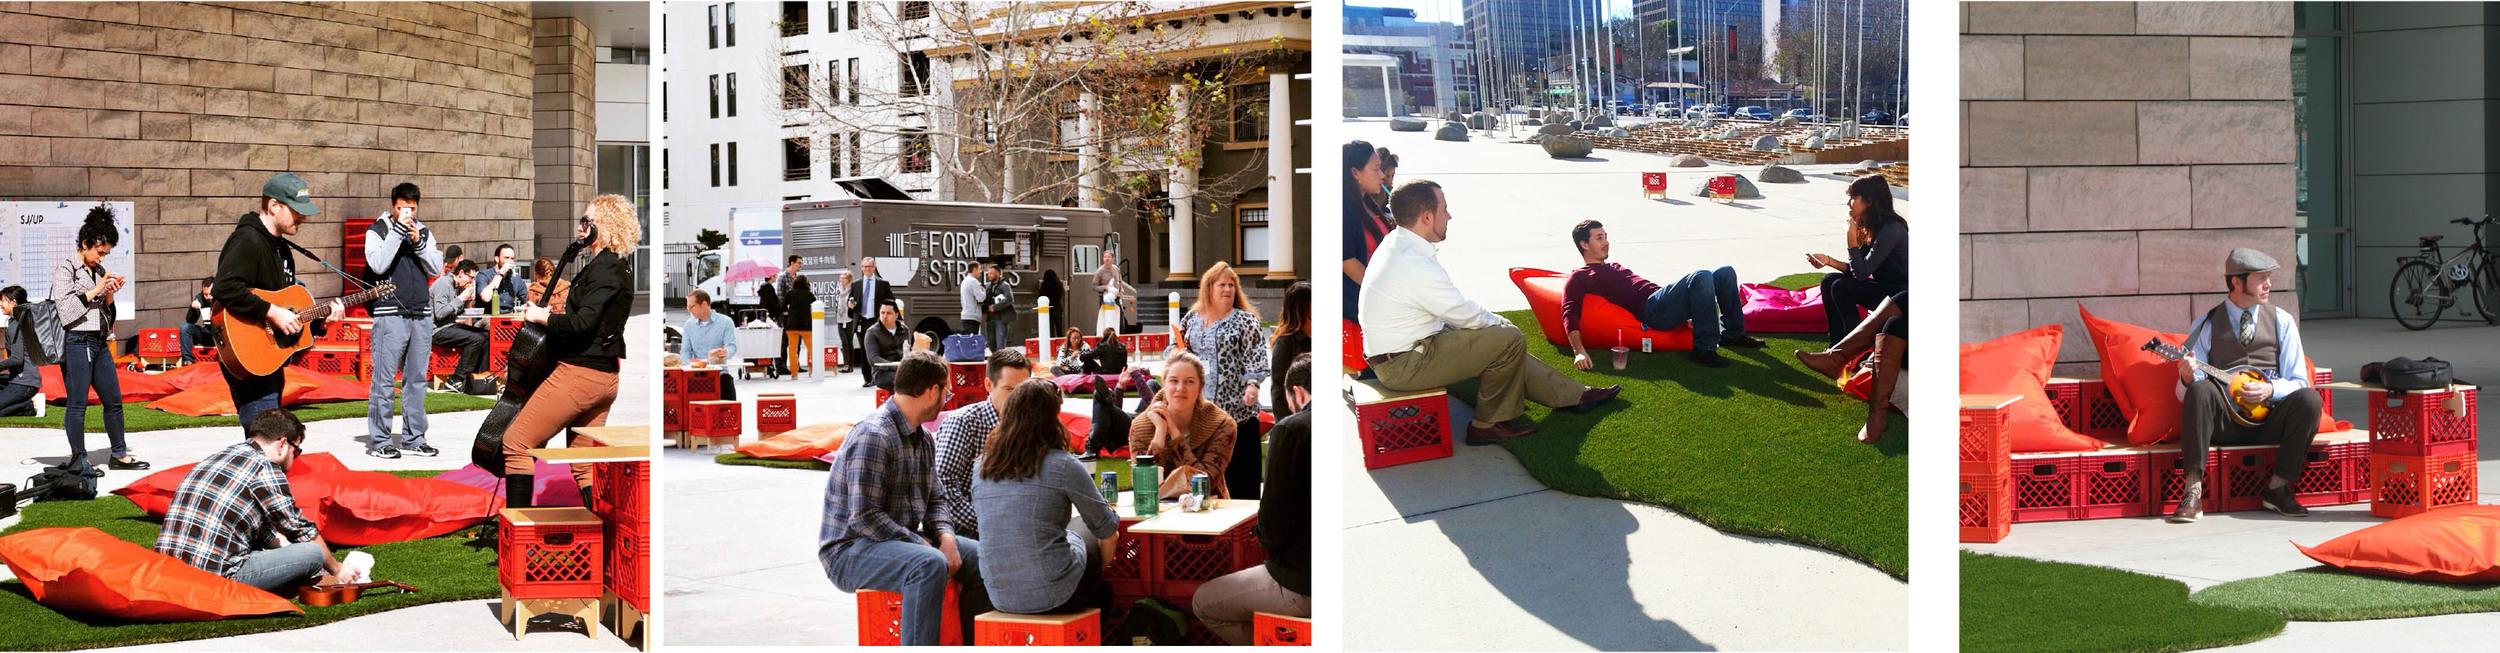 A Day of Prototyping City Hall Plaza   San Francisco